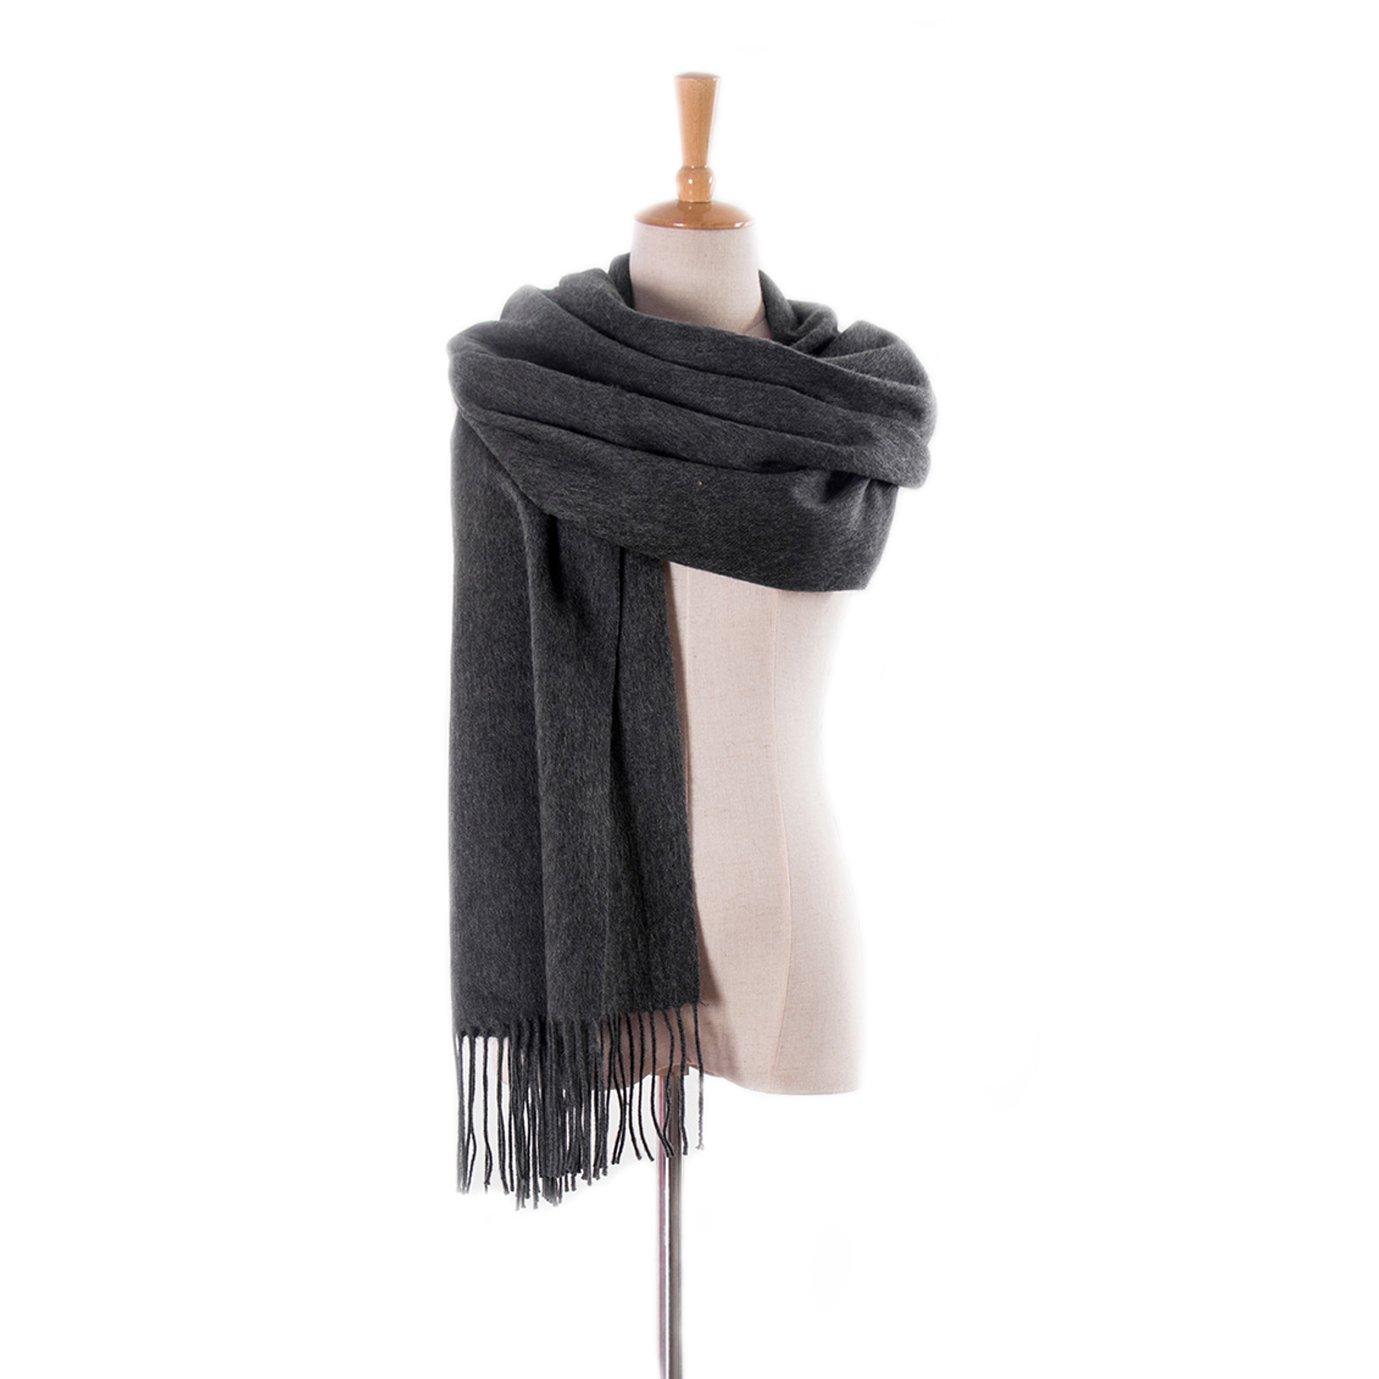 BaronHong Womens Tassels Lambswool Scarf Winter Large Wrap Shawl